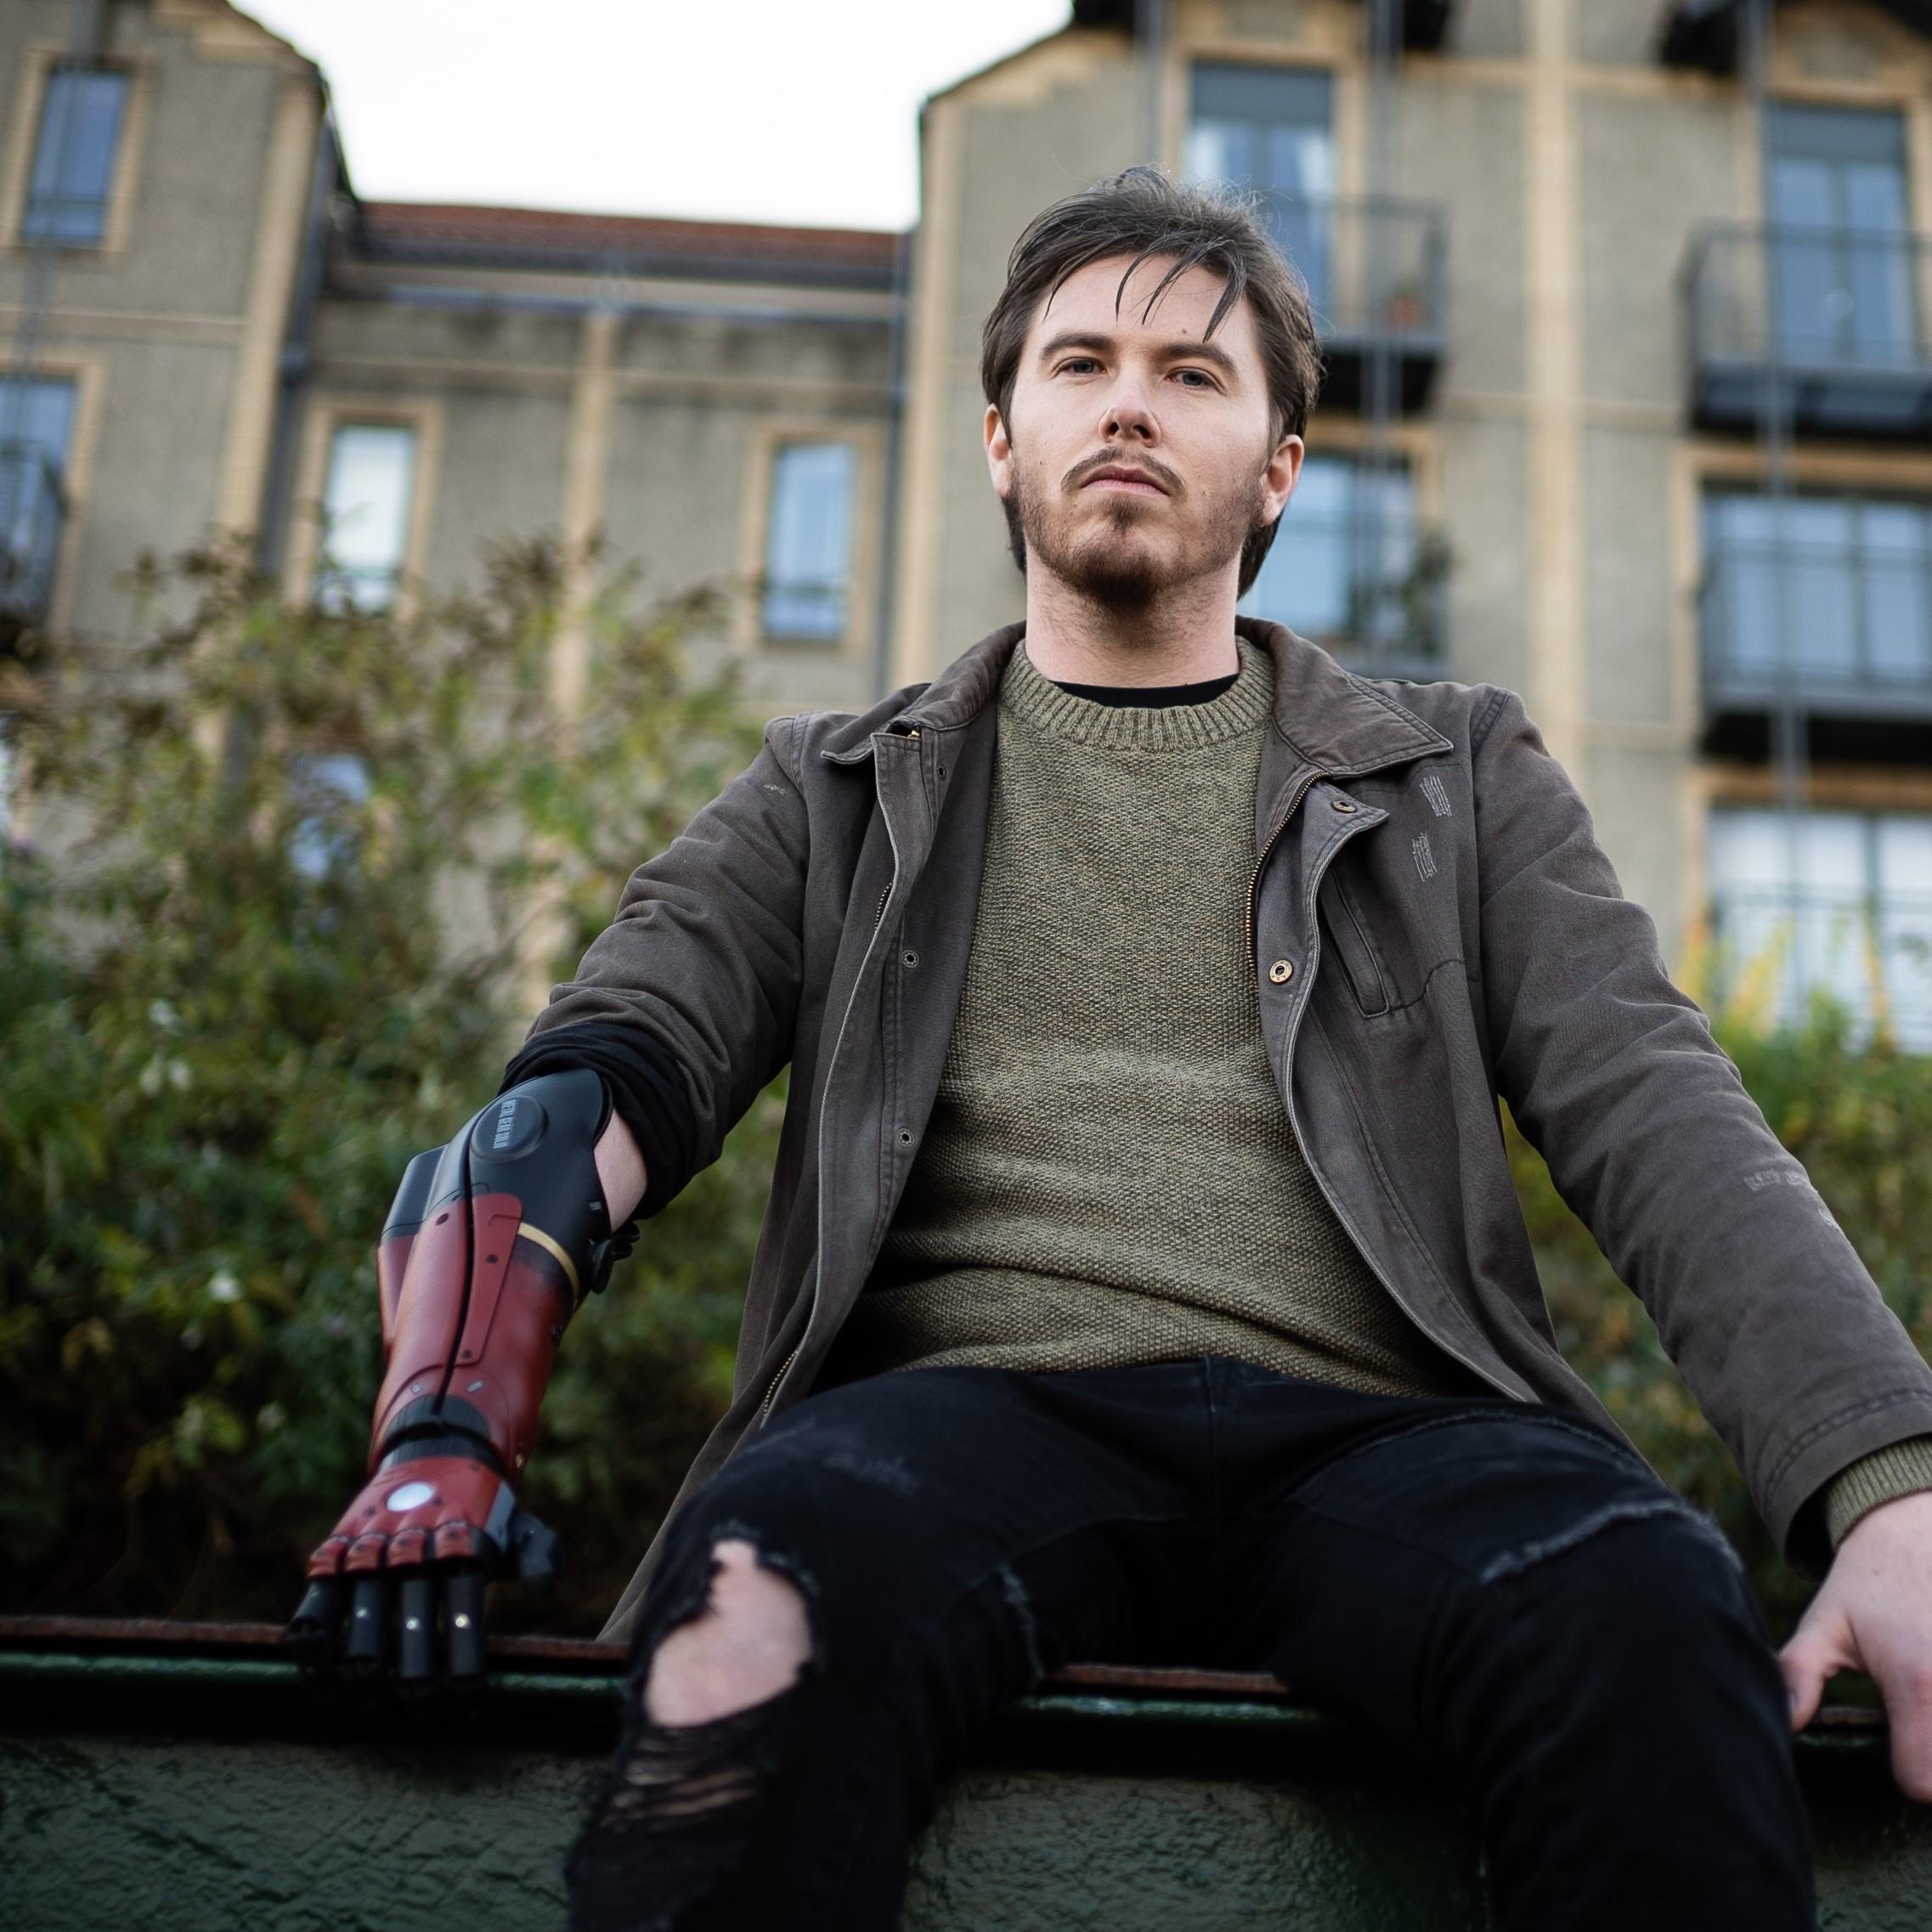 bionic Daniel wearing metal gear solid Hero Arm